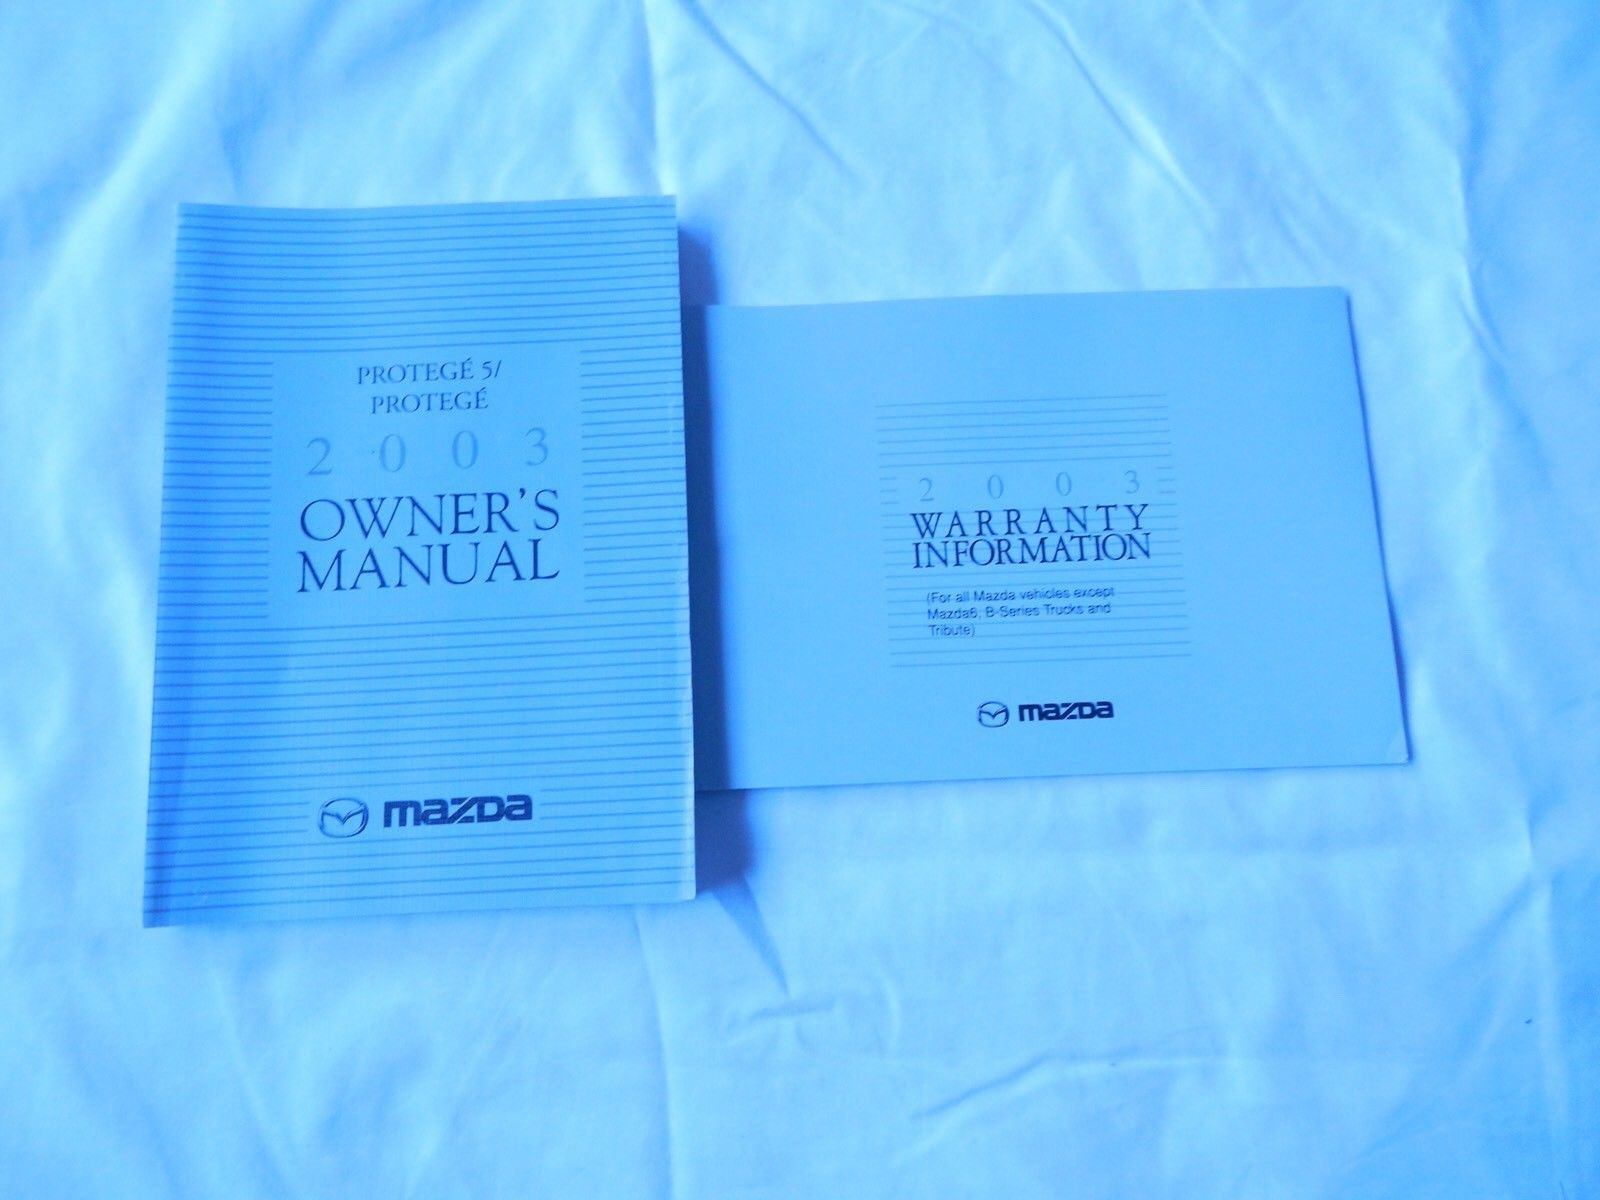 2003 mazda prot g five prot g owners and 50 similar items rh bonanza com 2003 mazda protege5 owner's manual 2003 mazda protege repair manual free